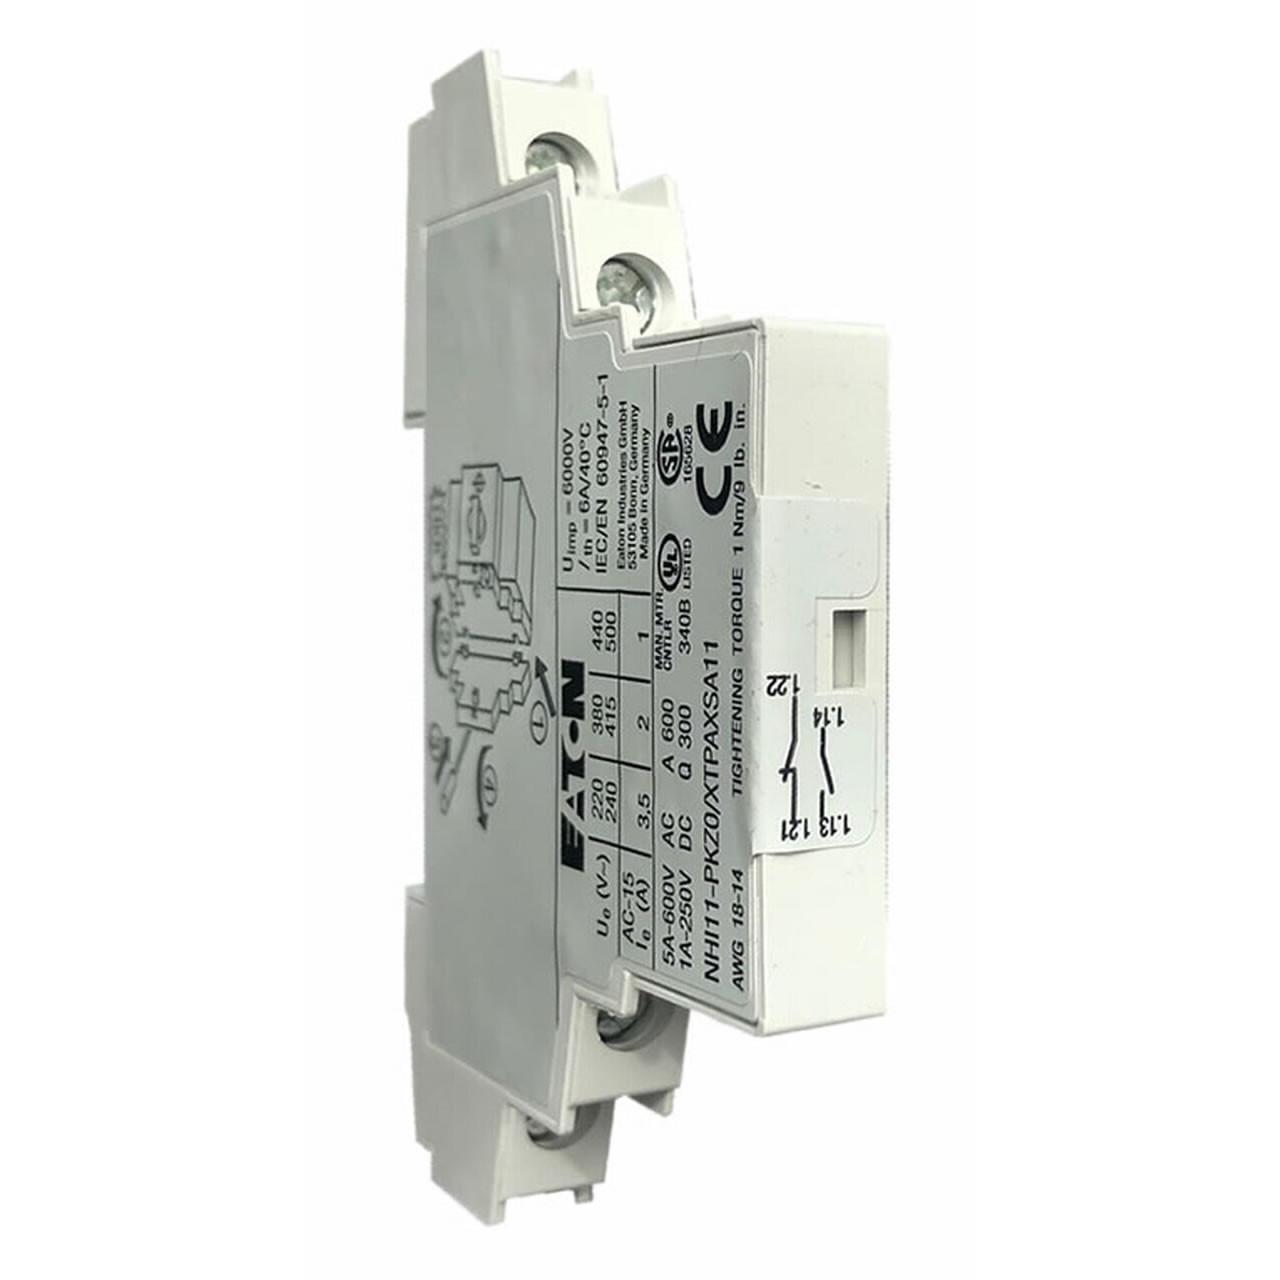 Eaton XTPAXSA11 auxiliary contact